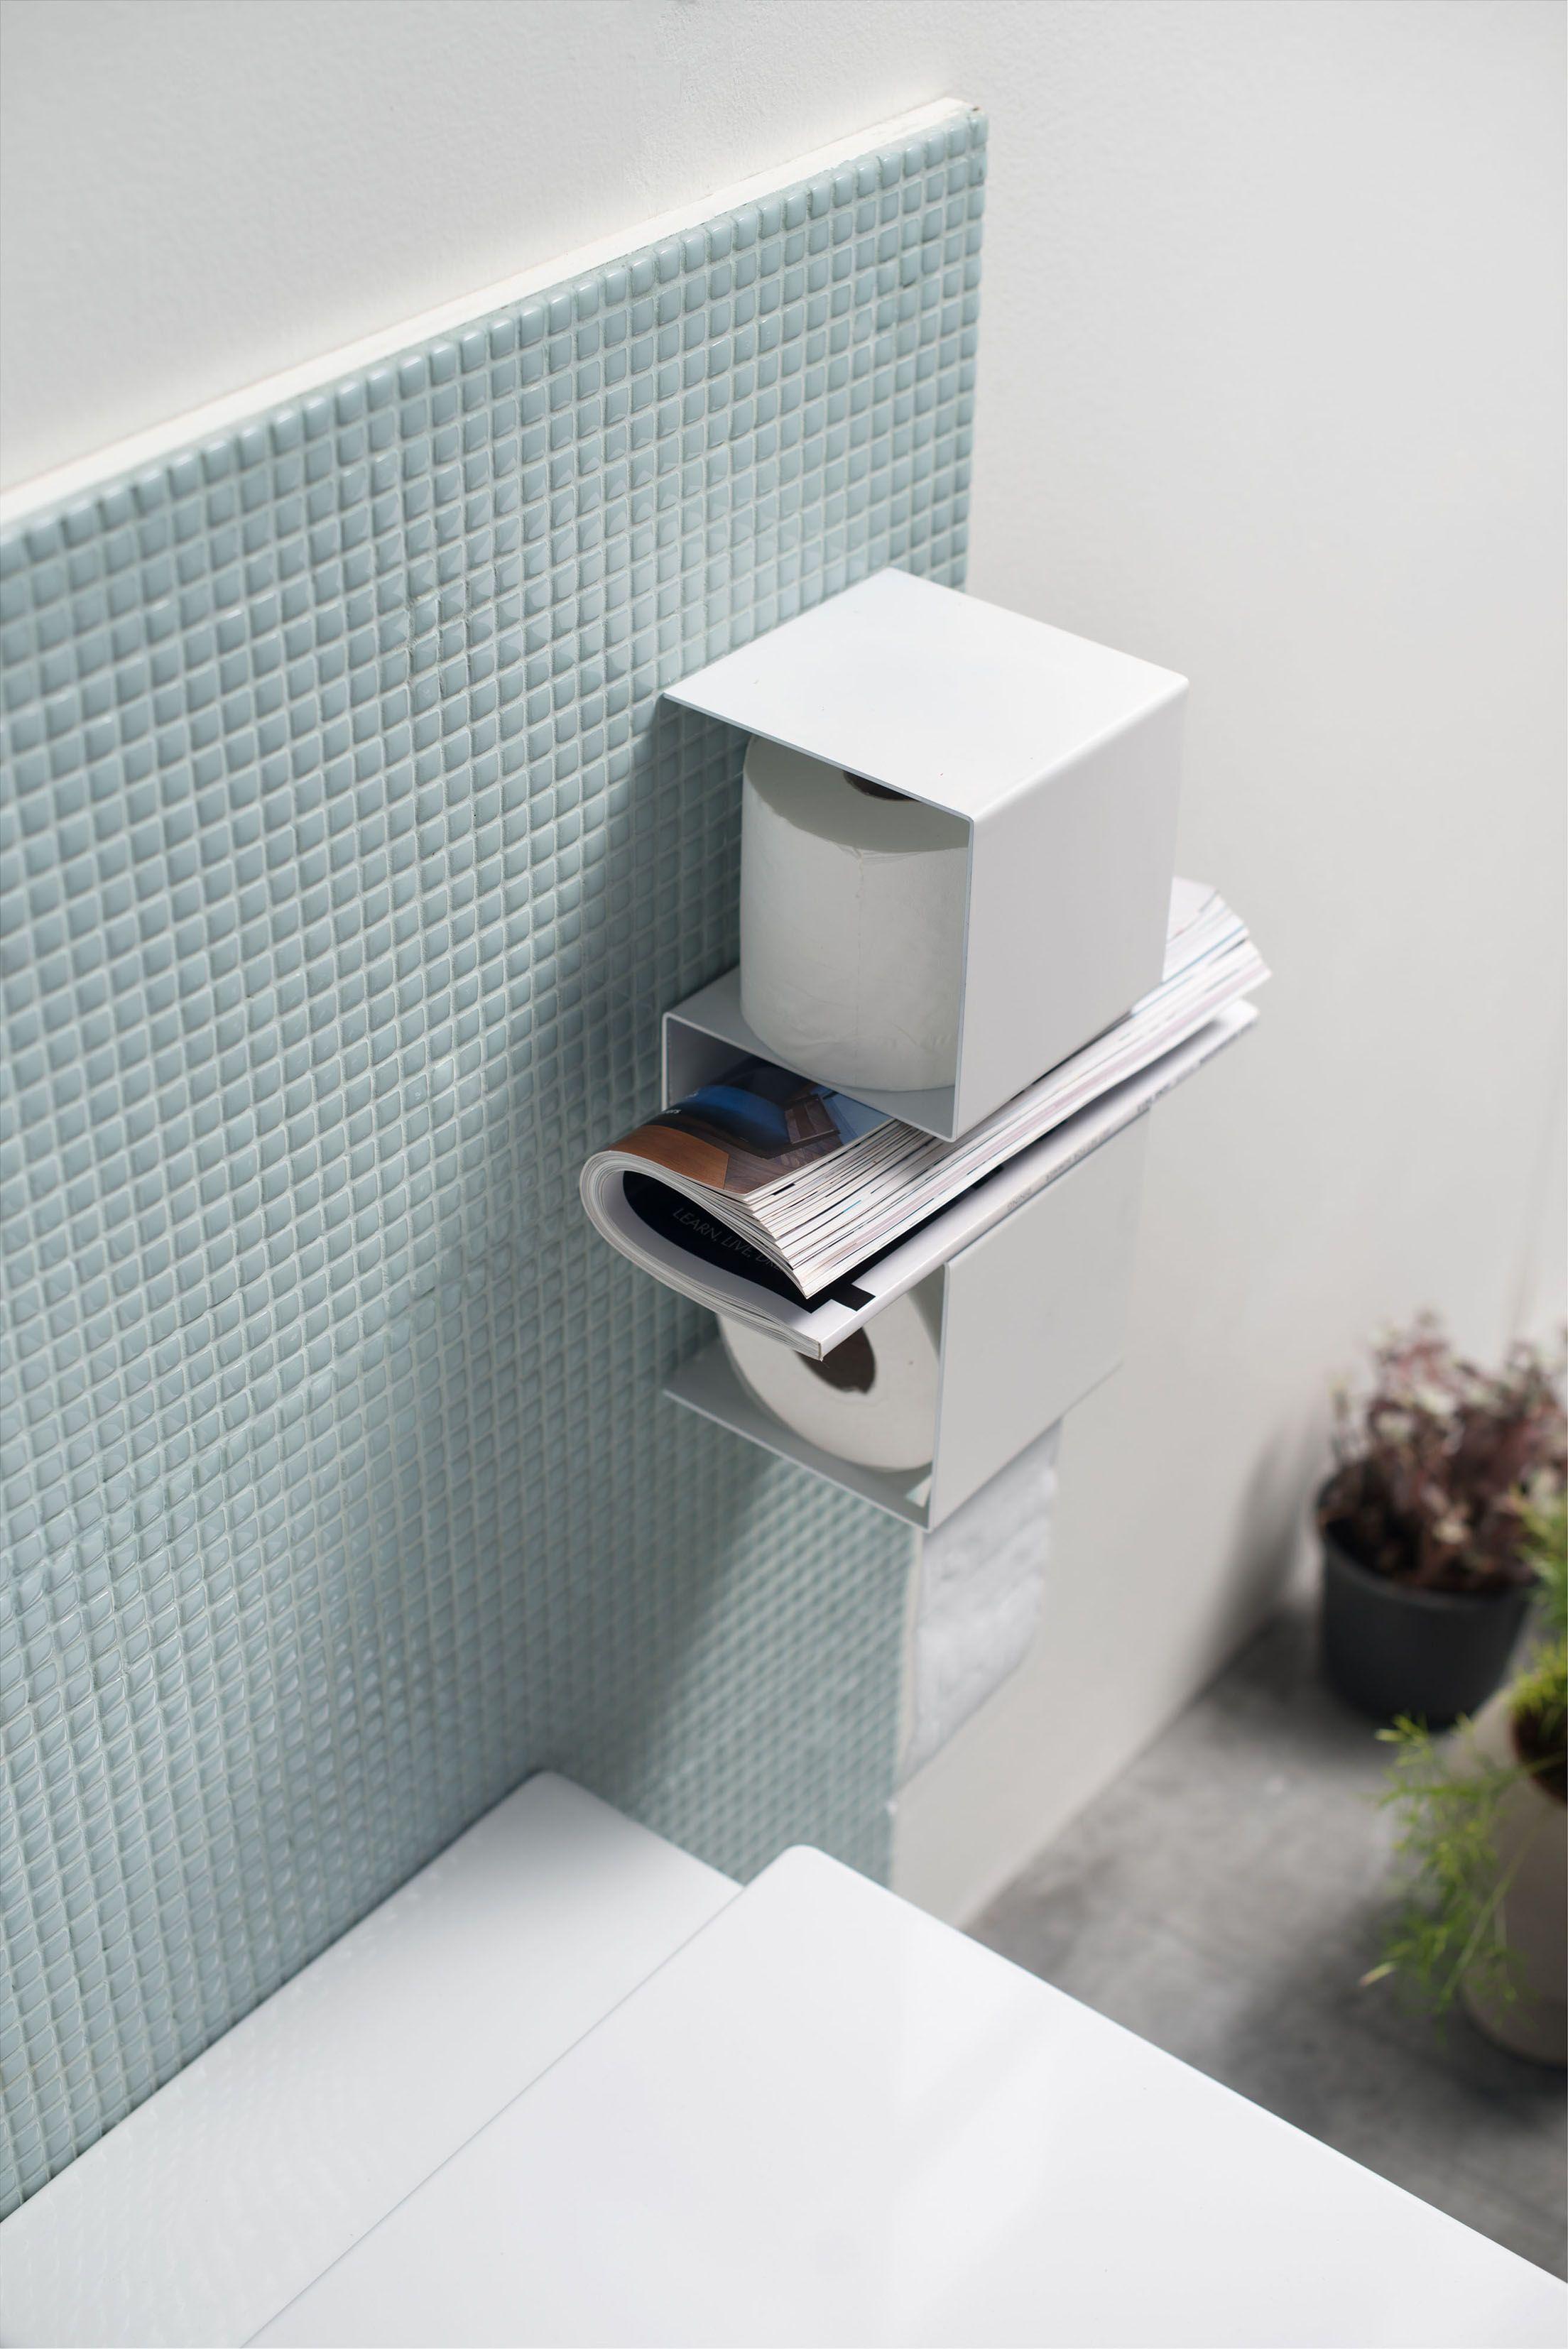 INTEAM toilet paper holder - € 51,00 http://www.ex-t.com/shop-online ...